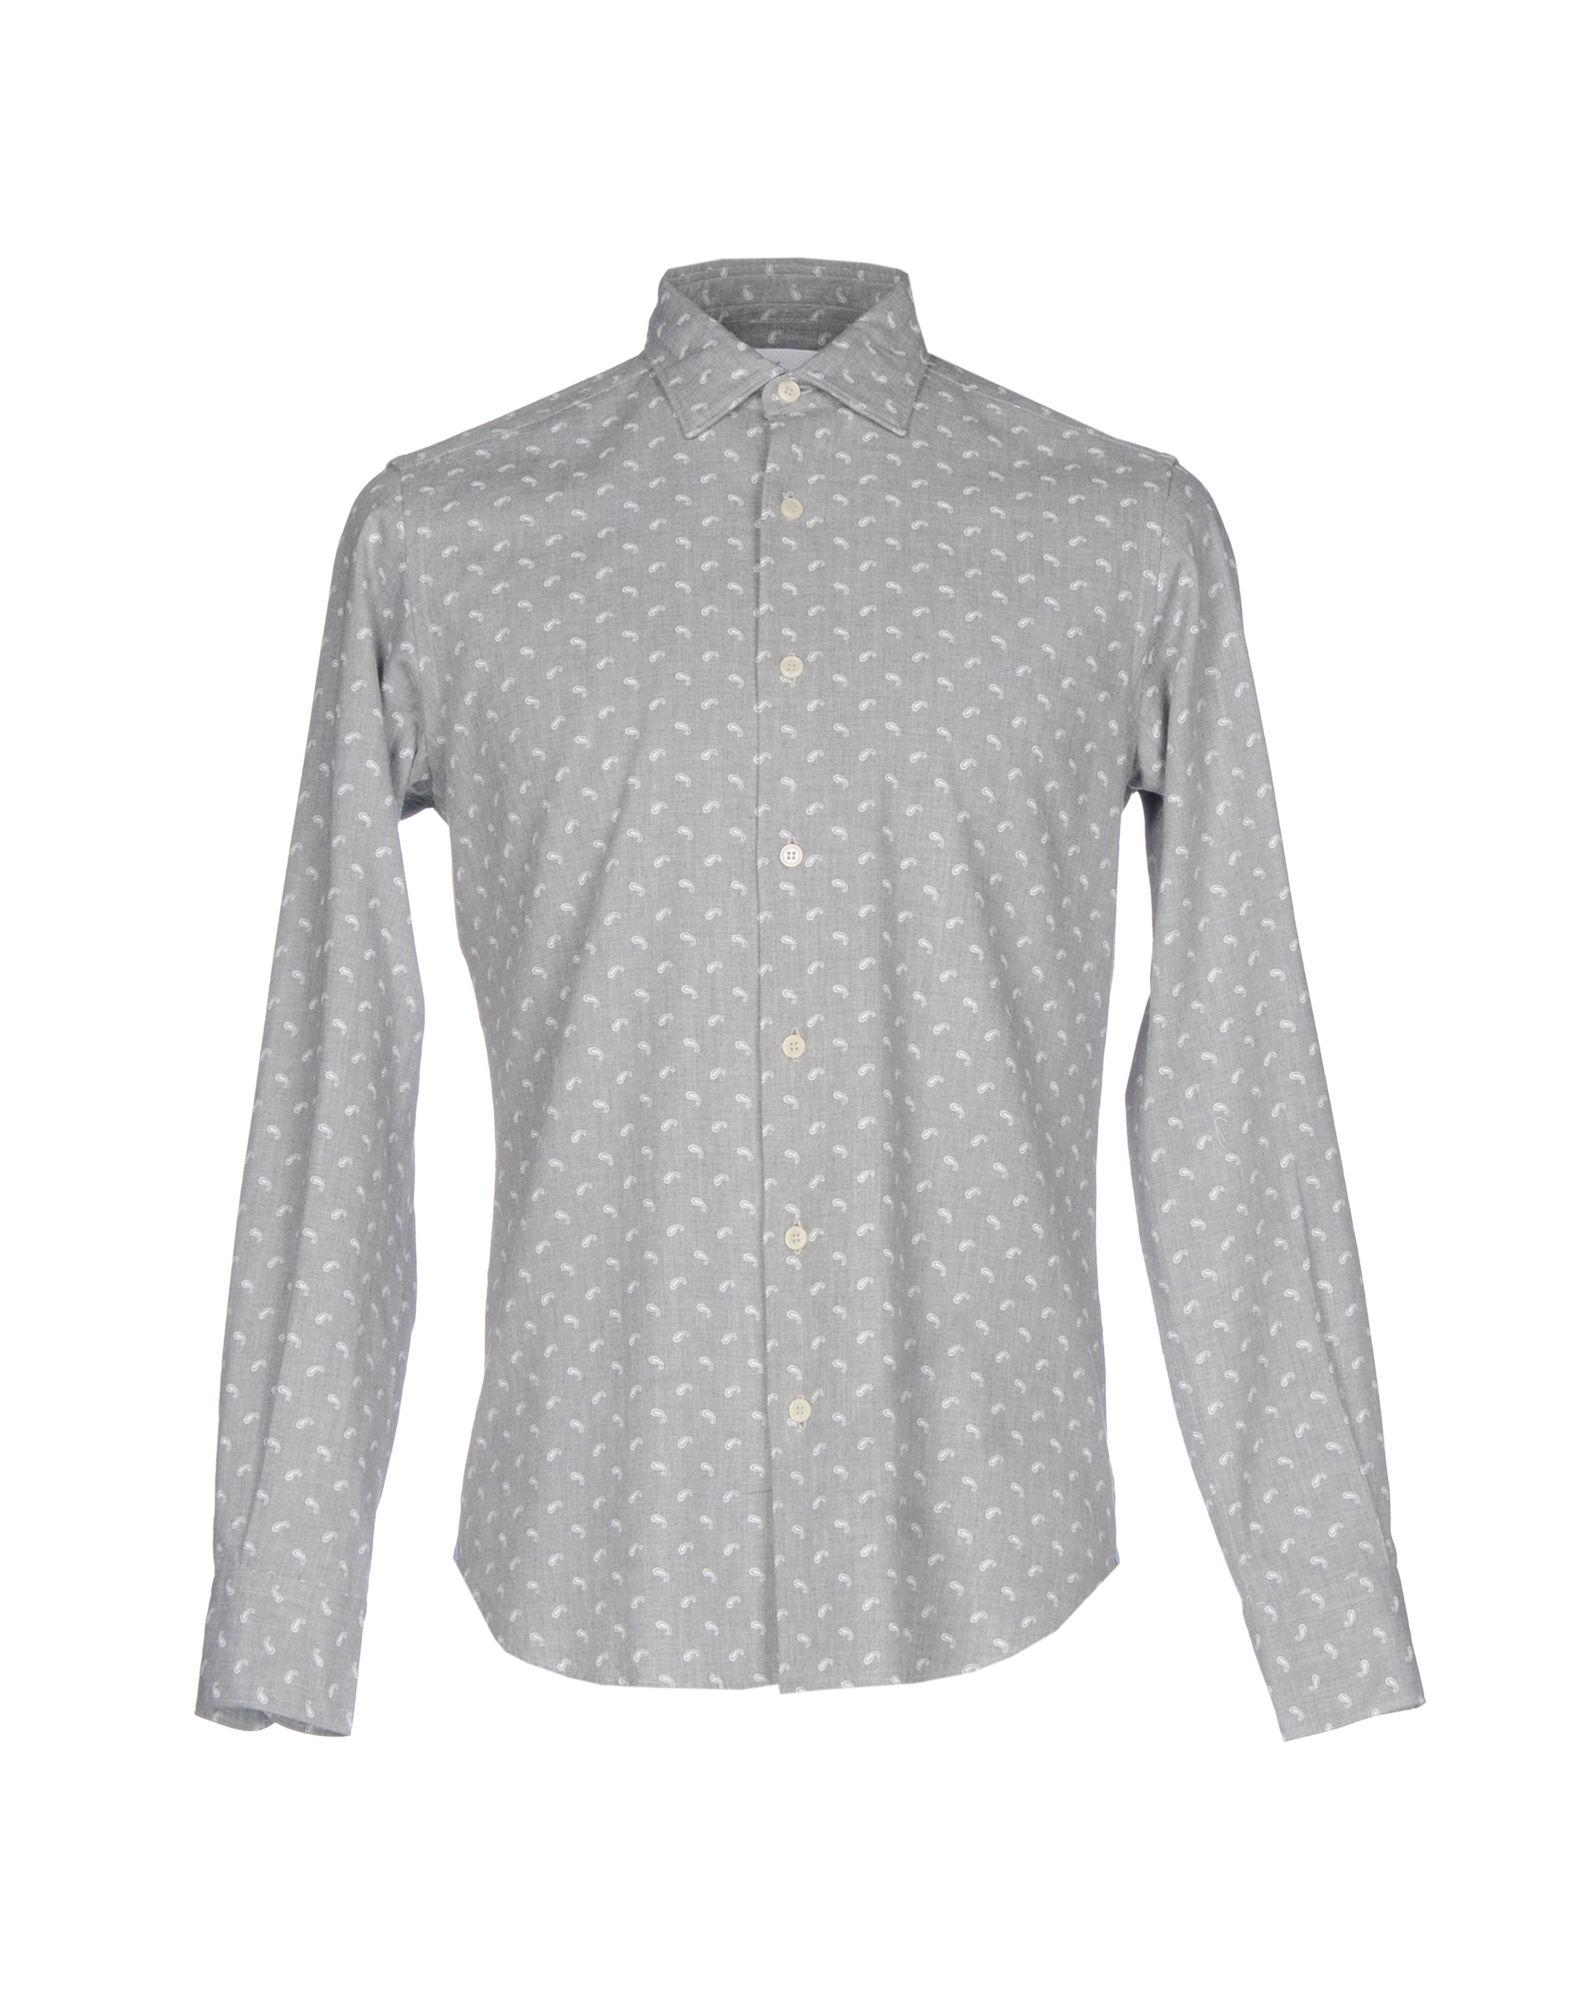 цены на MONTALIANI Pубашка в интернет-магазинах